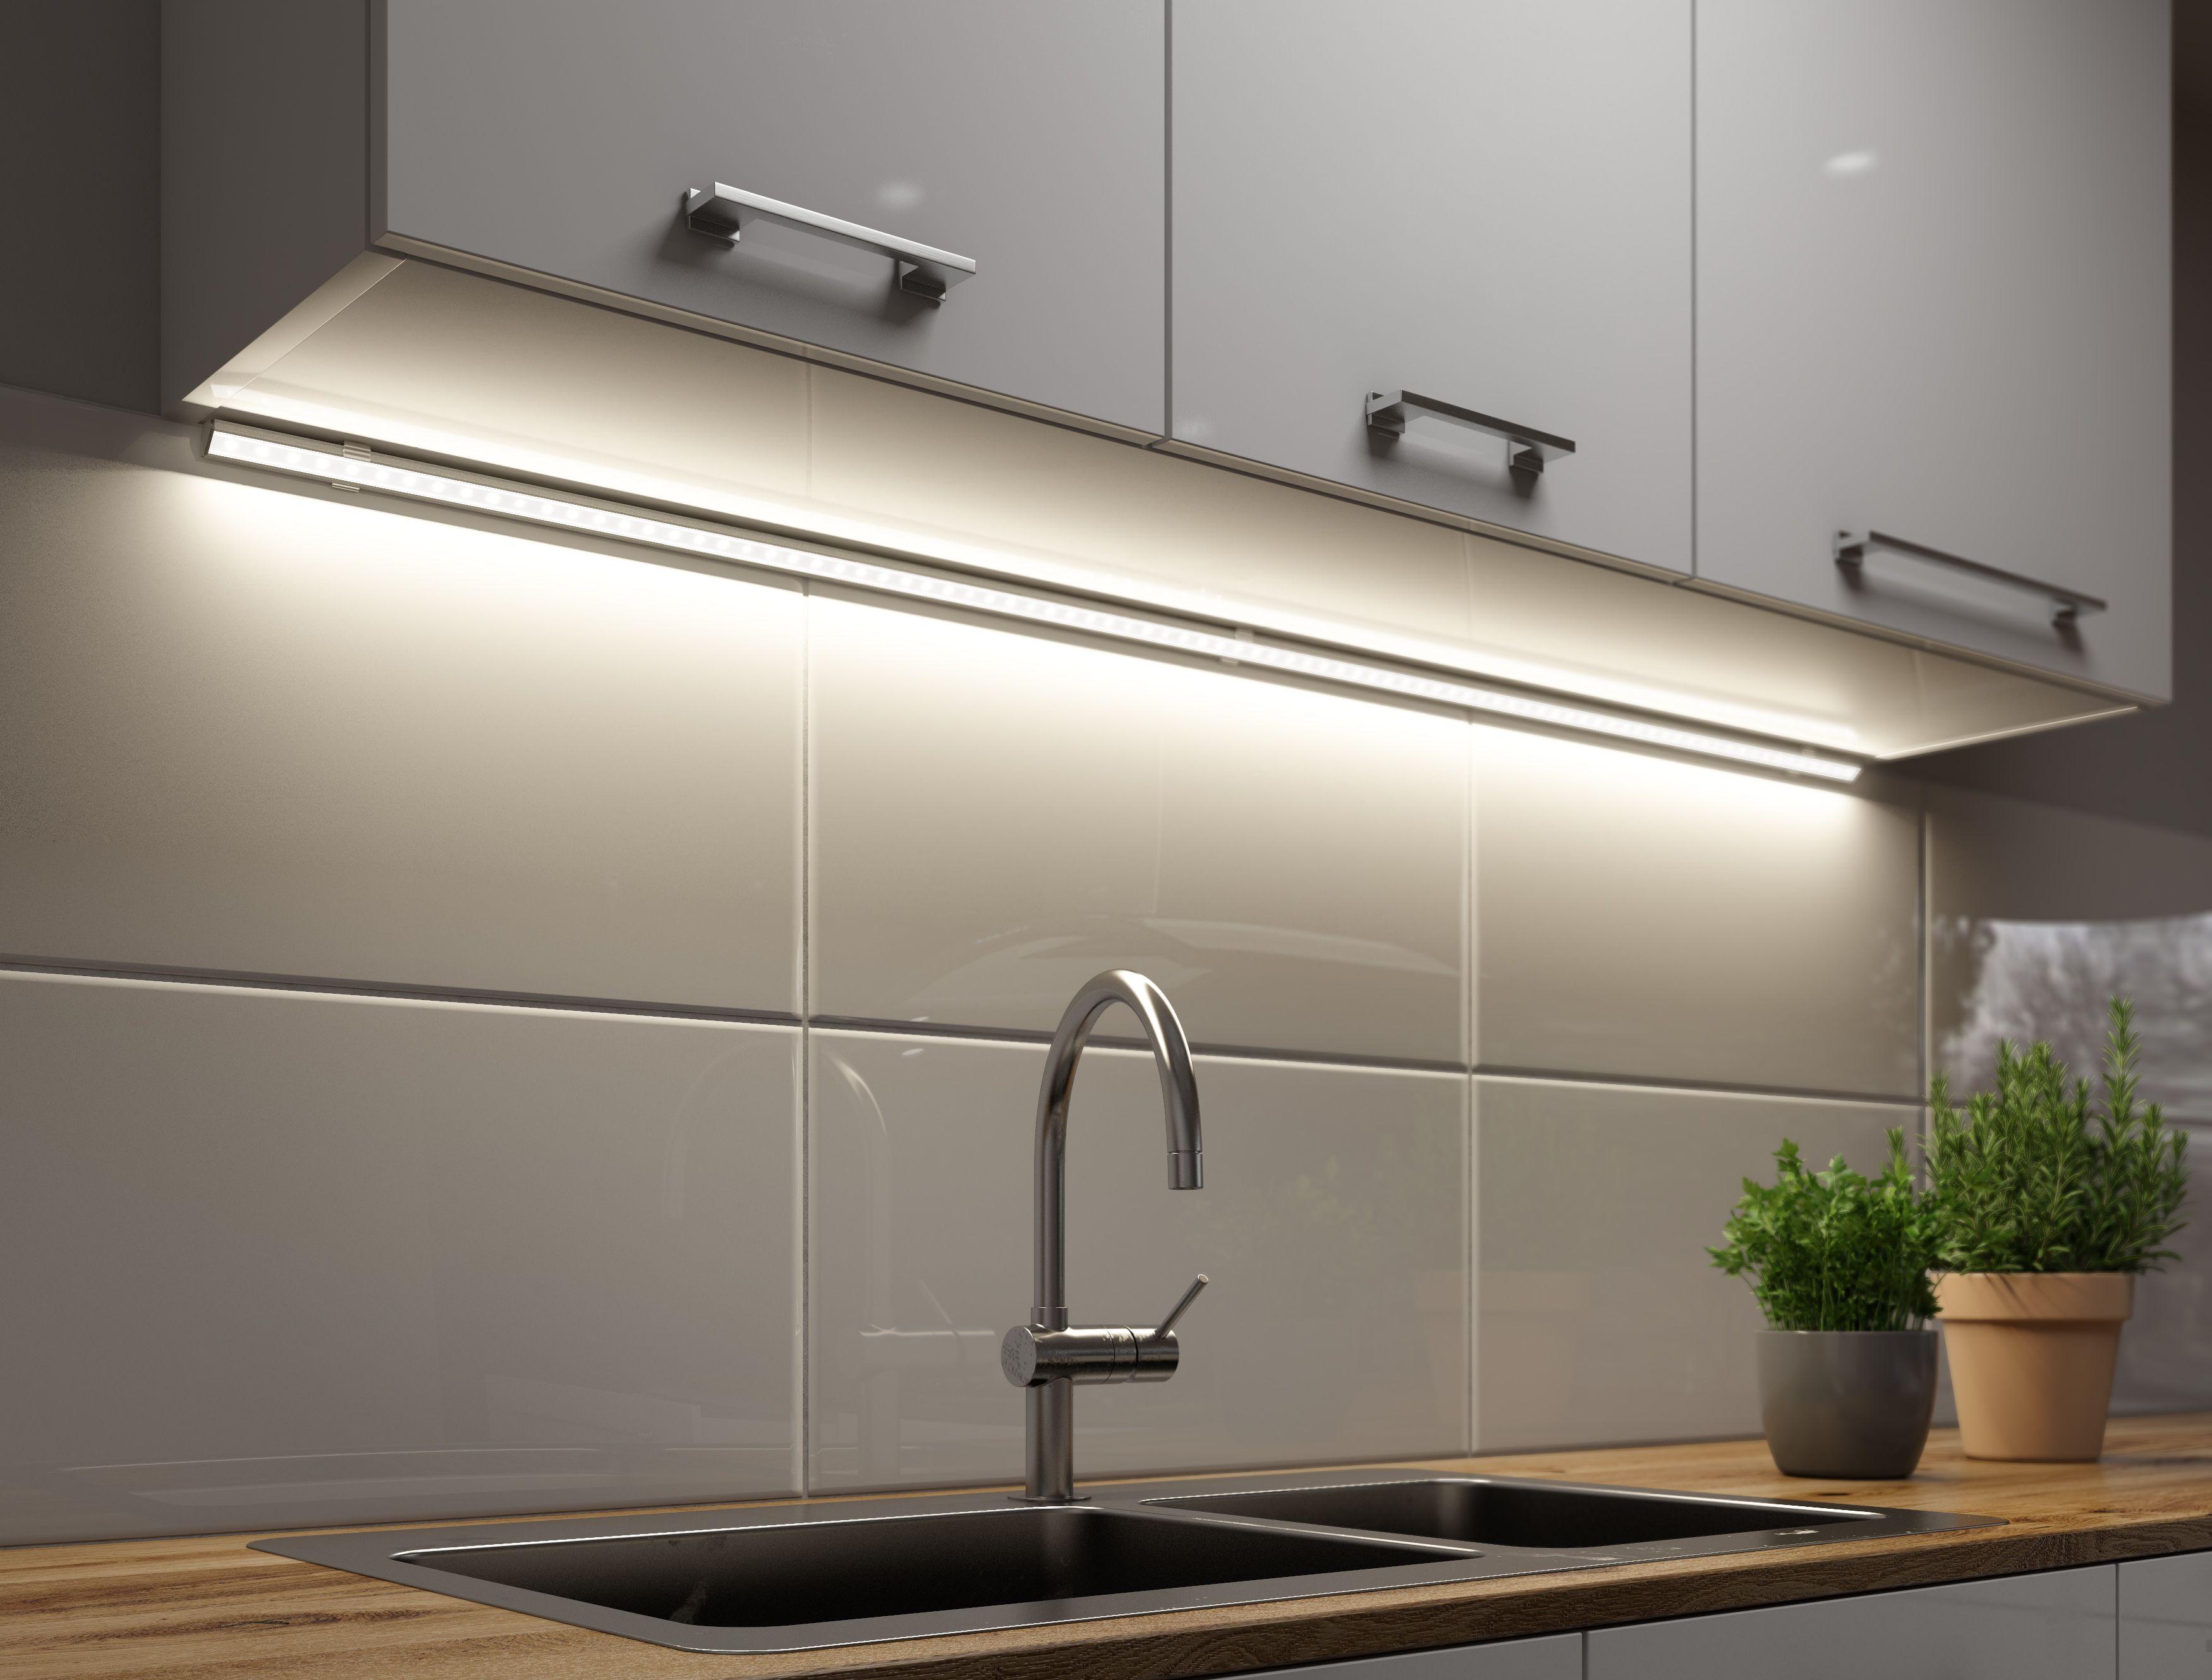 Kitchen Cabinets Lighting Led Lighting For Kitchen Profile C Lumines Kitchen Storage Kitcheni Hanging Lights Kitchen Strip Lighting Kitchen Lighting